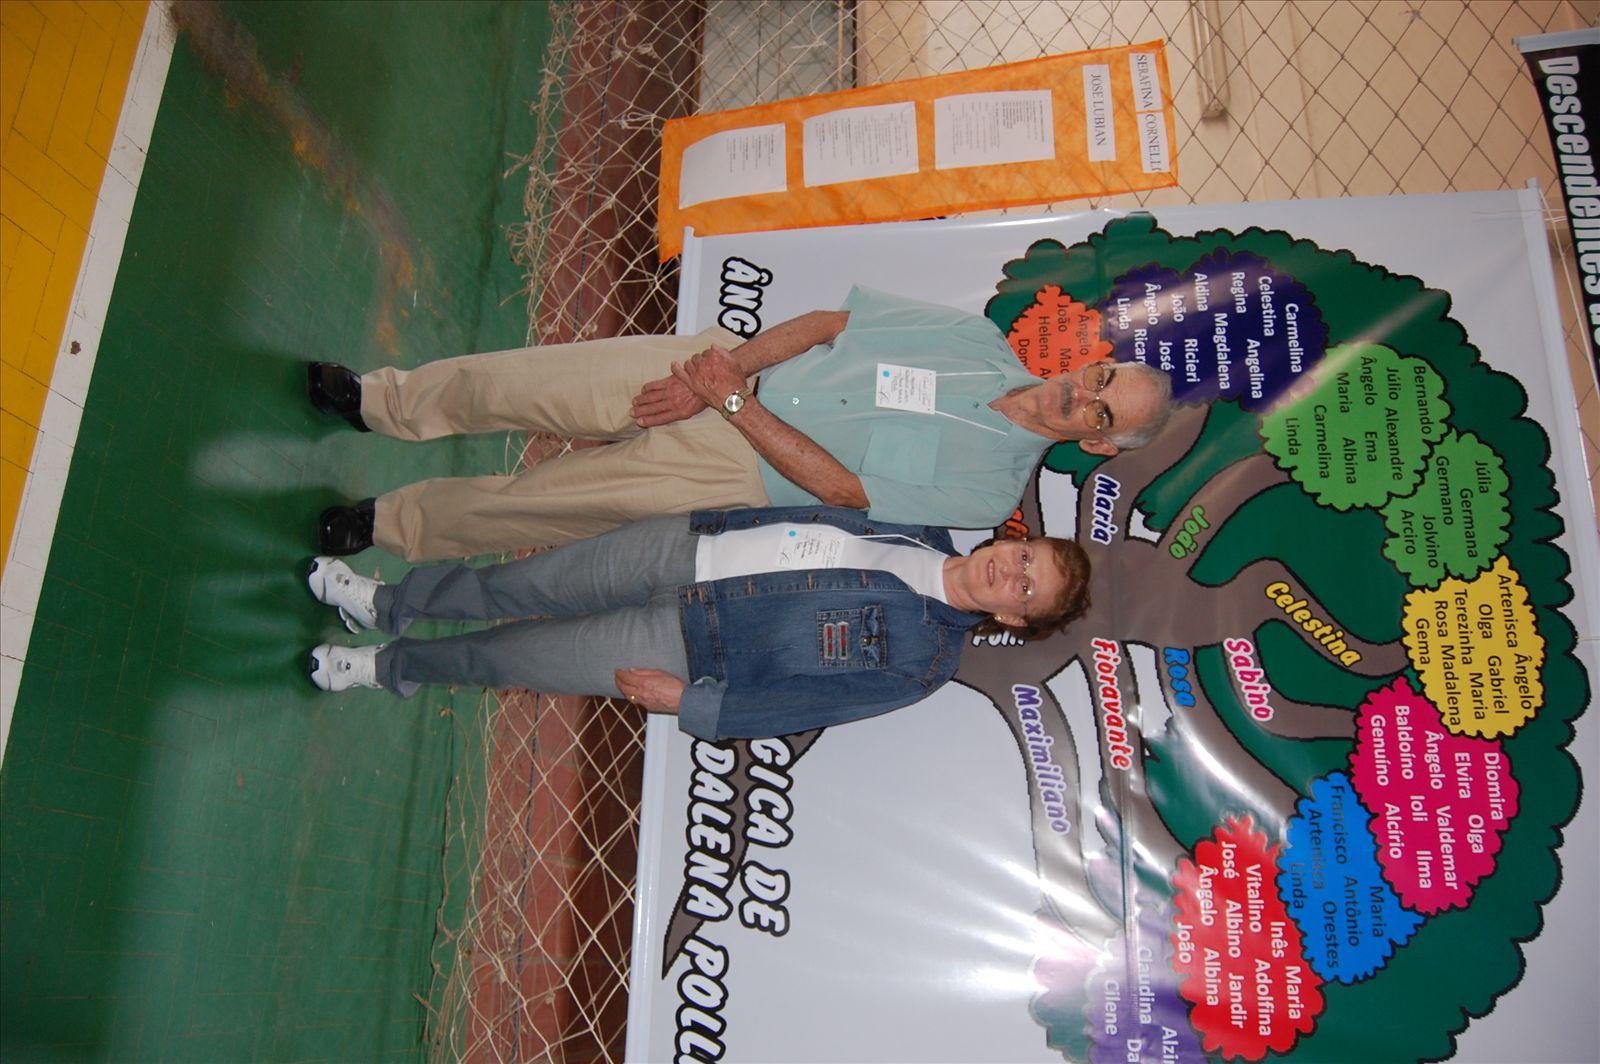 2º Encontro Família Cornelli - 11.10.2009 (75)_0